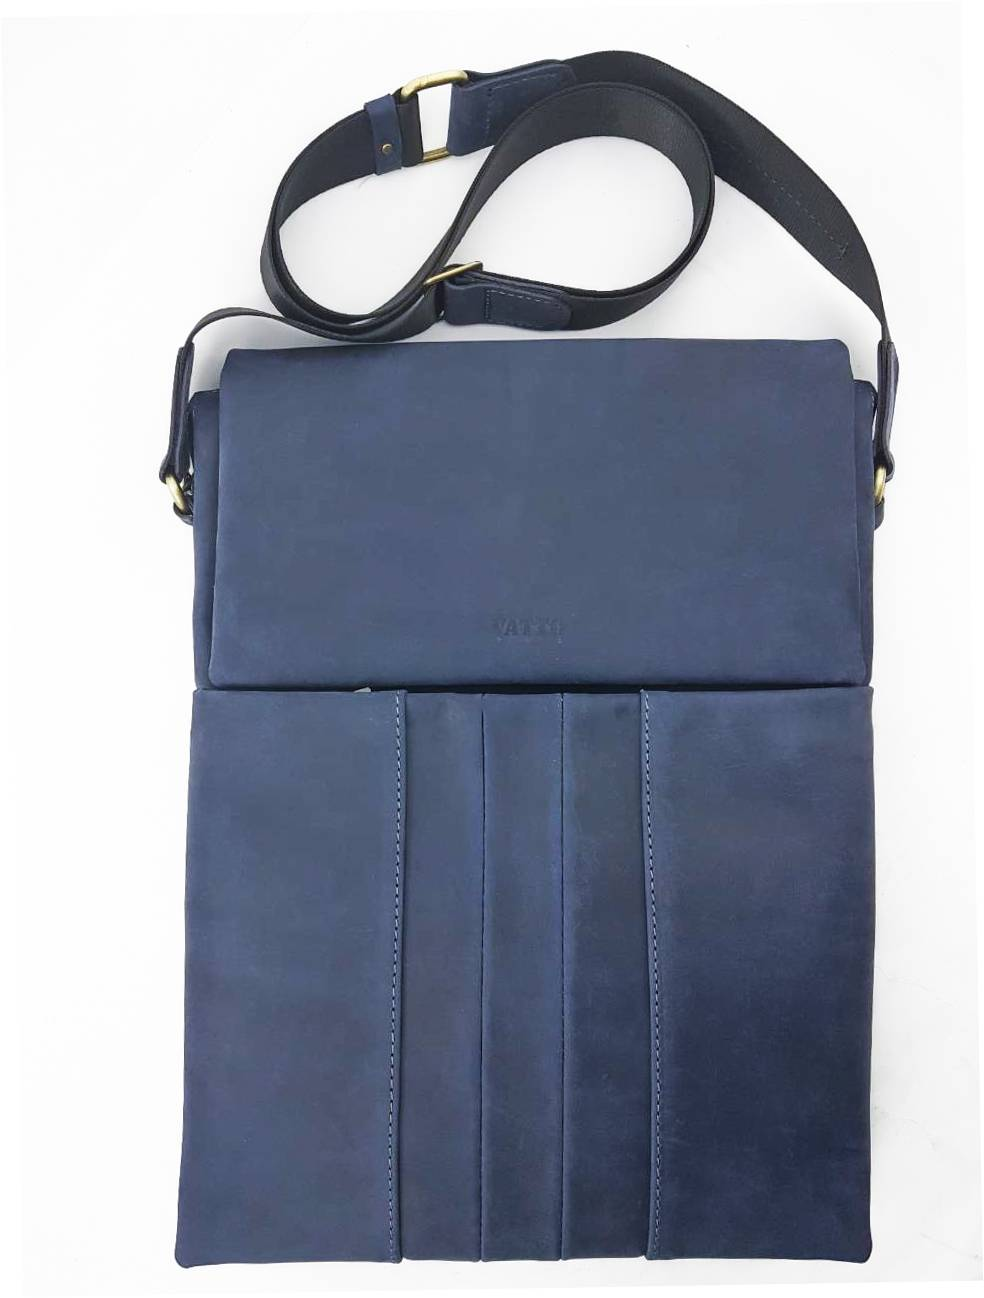 dd3659098a11 Мужская сумка VATTO Mk80.2 Kr600. Цена, купить Мужская сумка VATTO ...